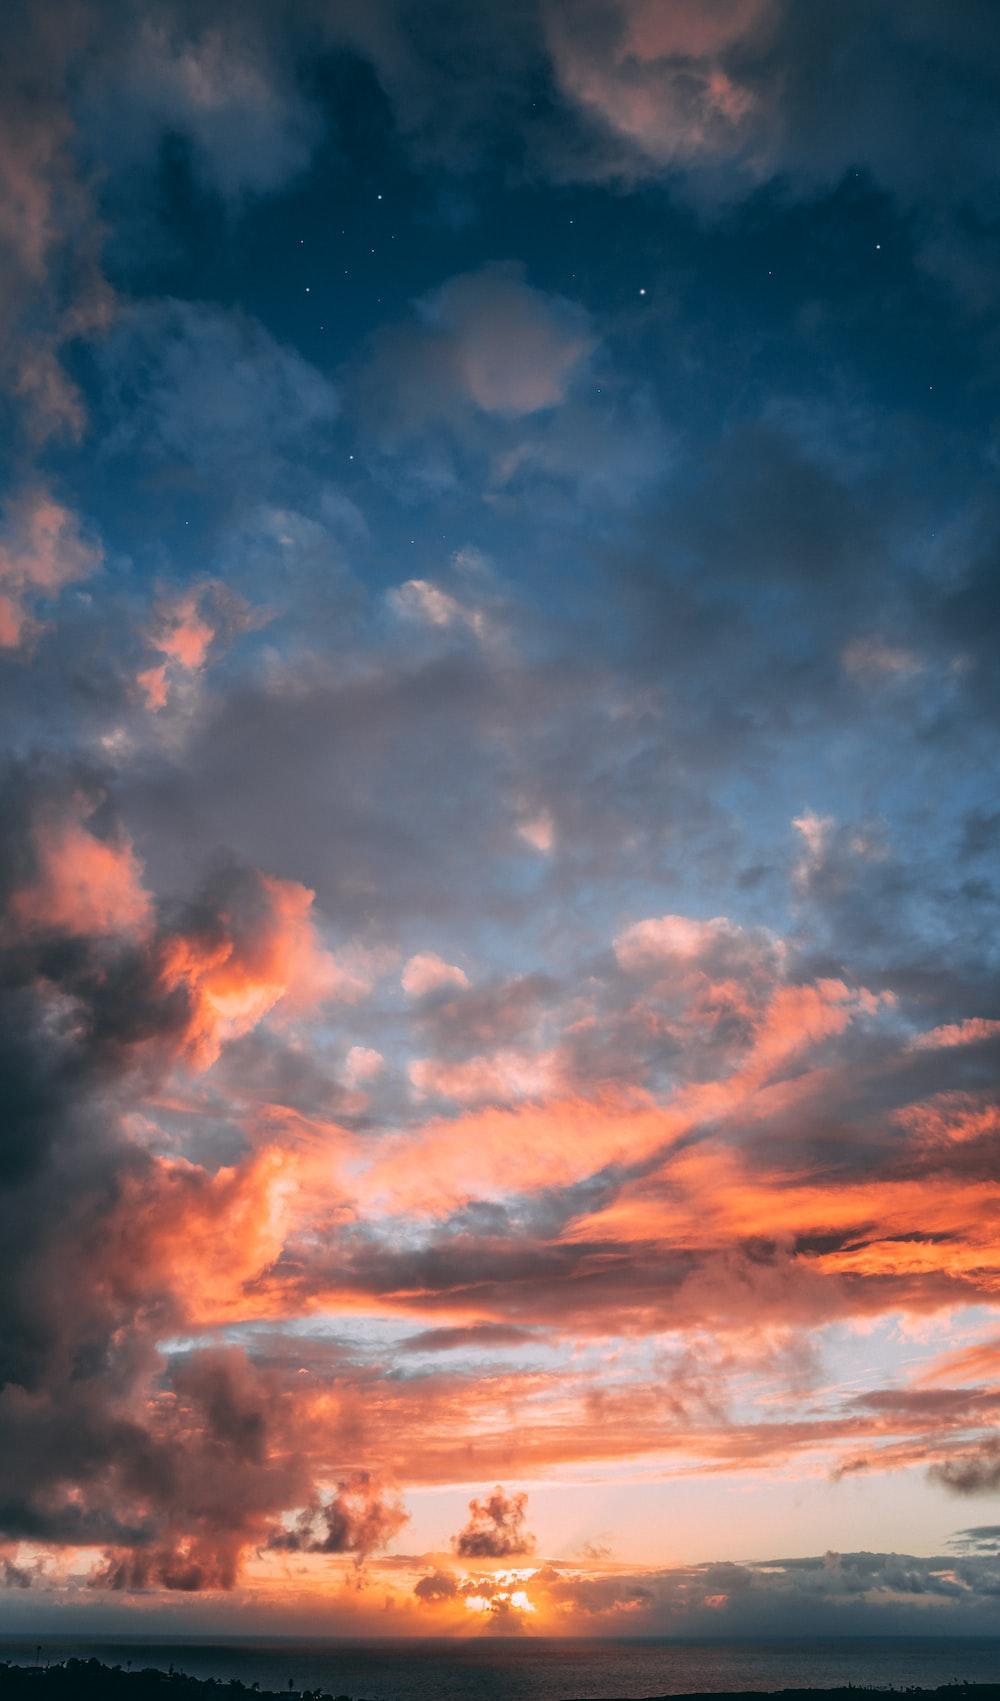 blue, orange, and gray skies